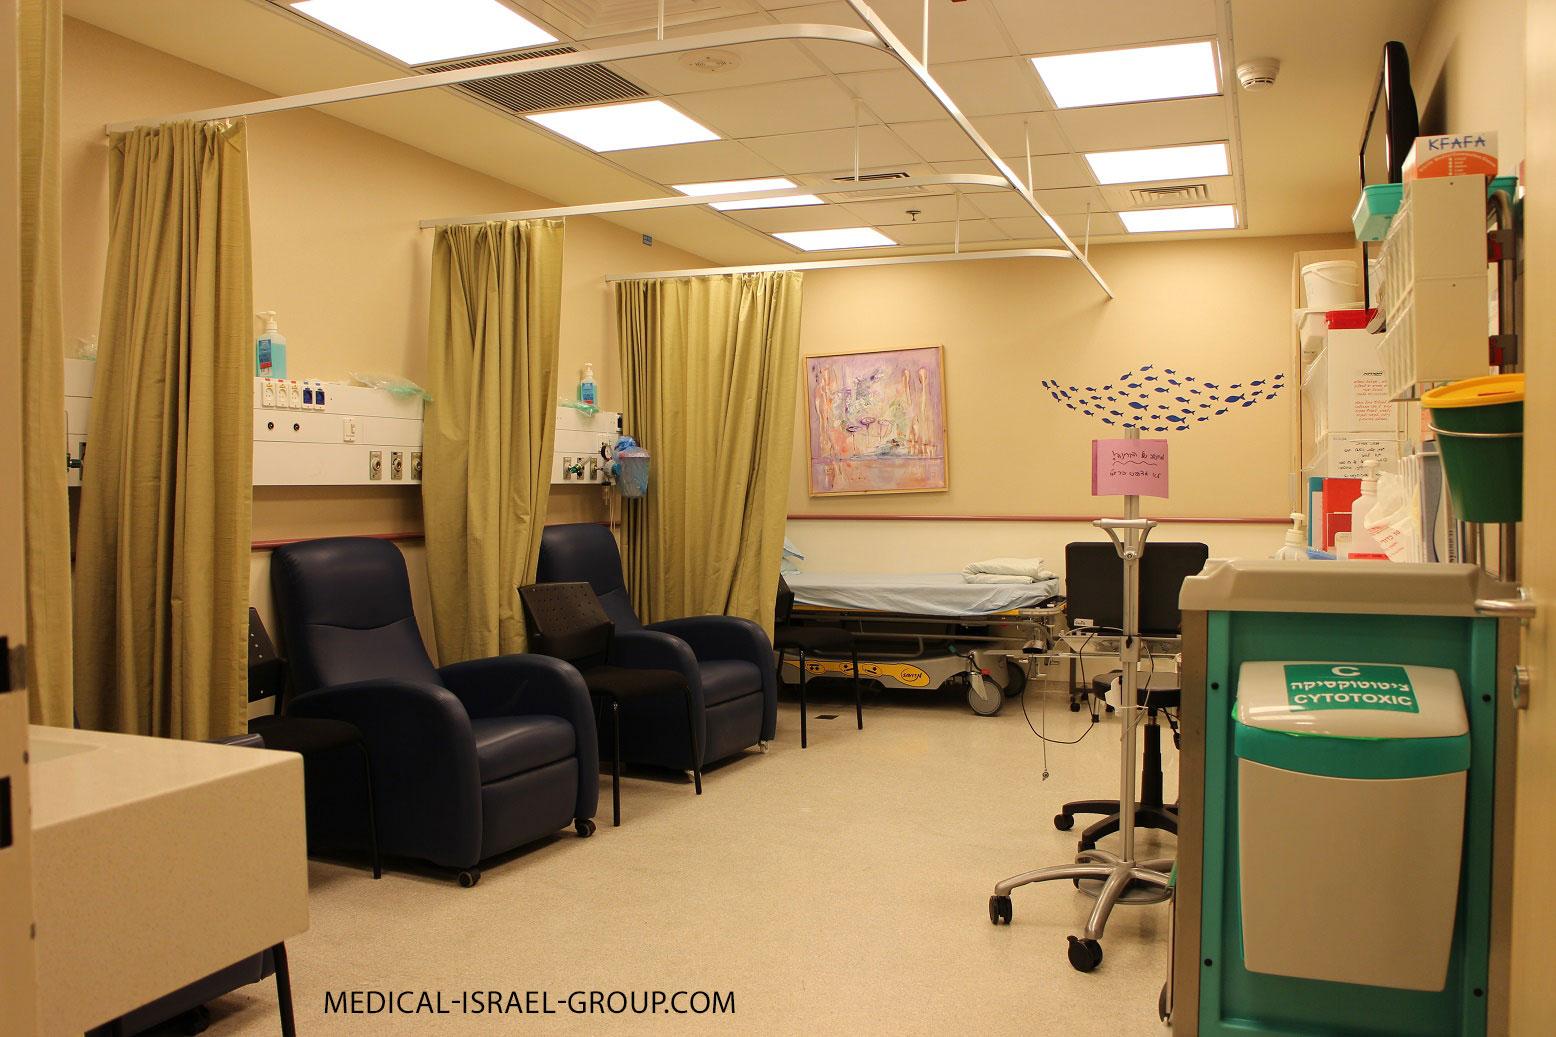 10 больница ростове дону